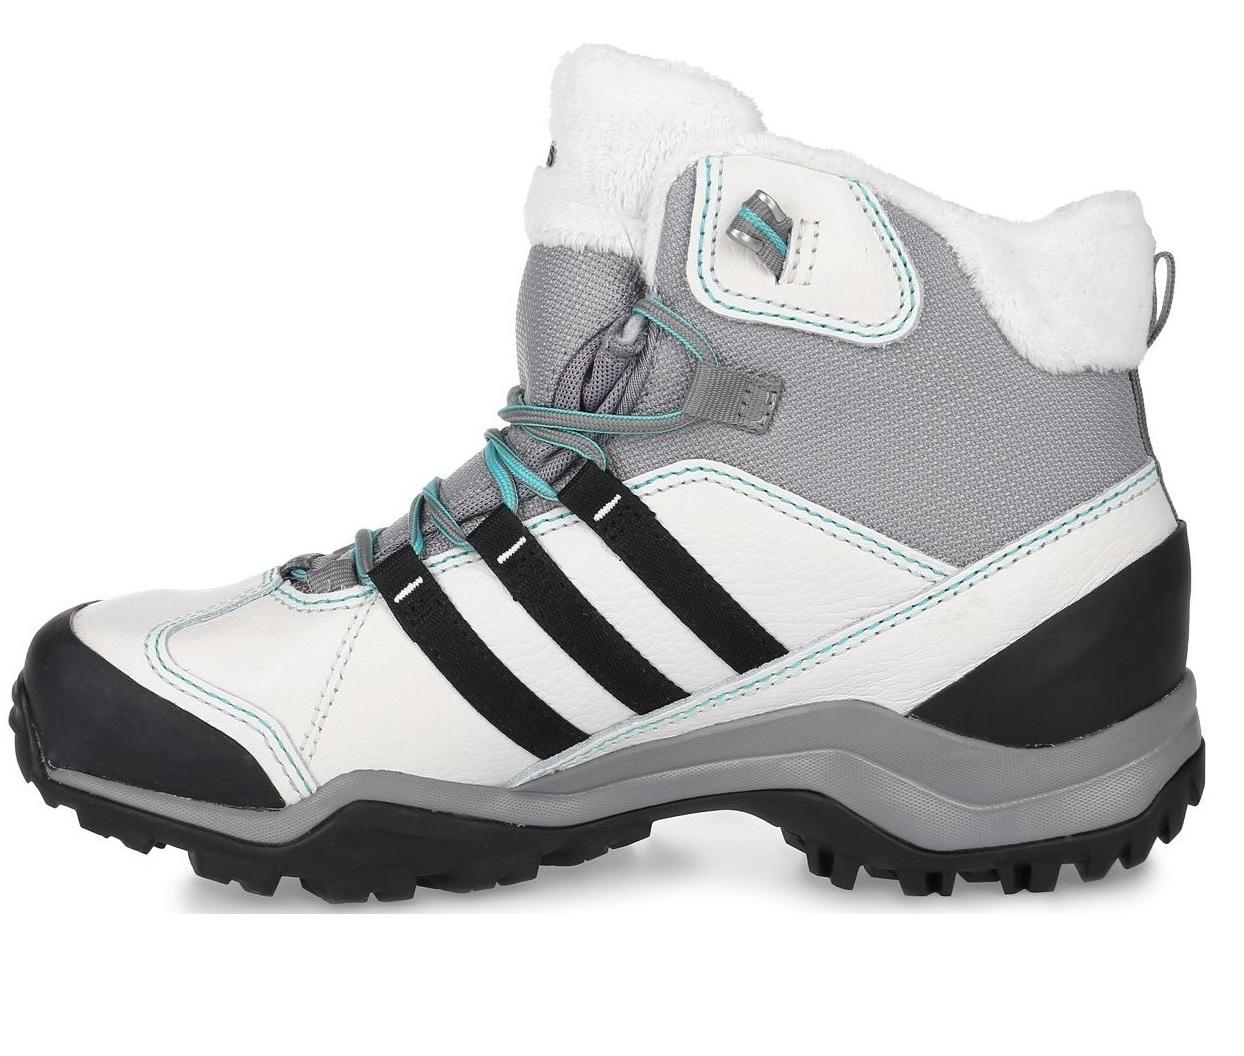 39ced10b Ботинки adidas WINTER HIKER II CP PL W M17332 купить за 4 763 руб в  интернет-магазин dealsport.ru